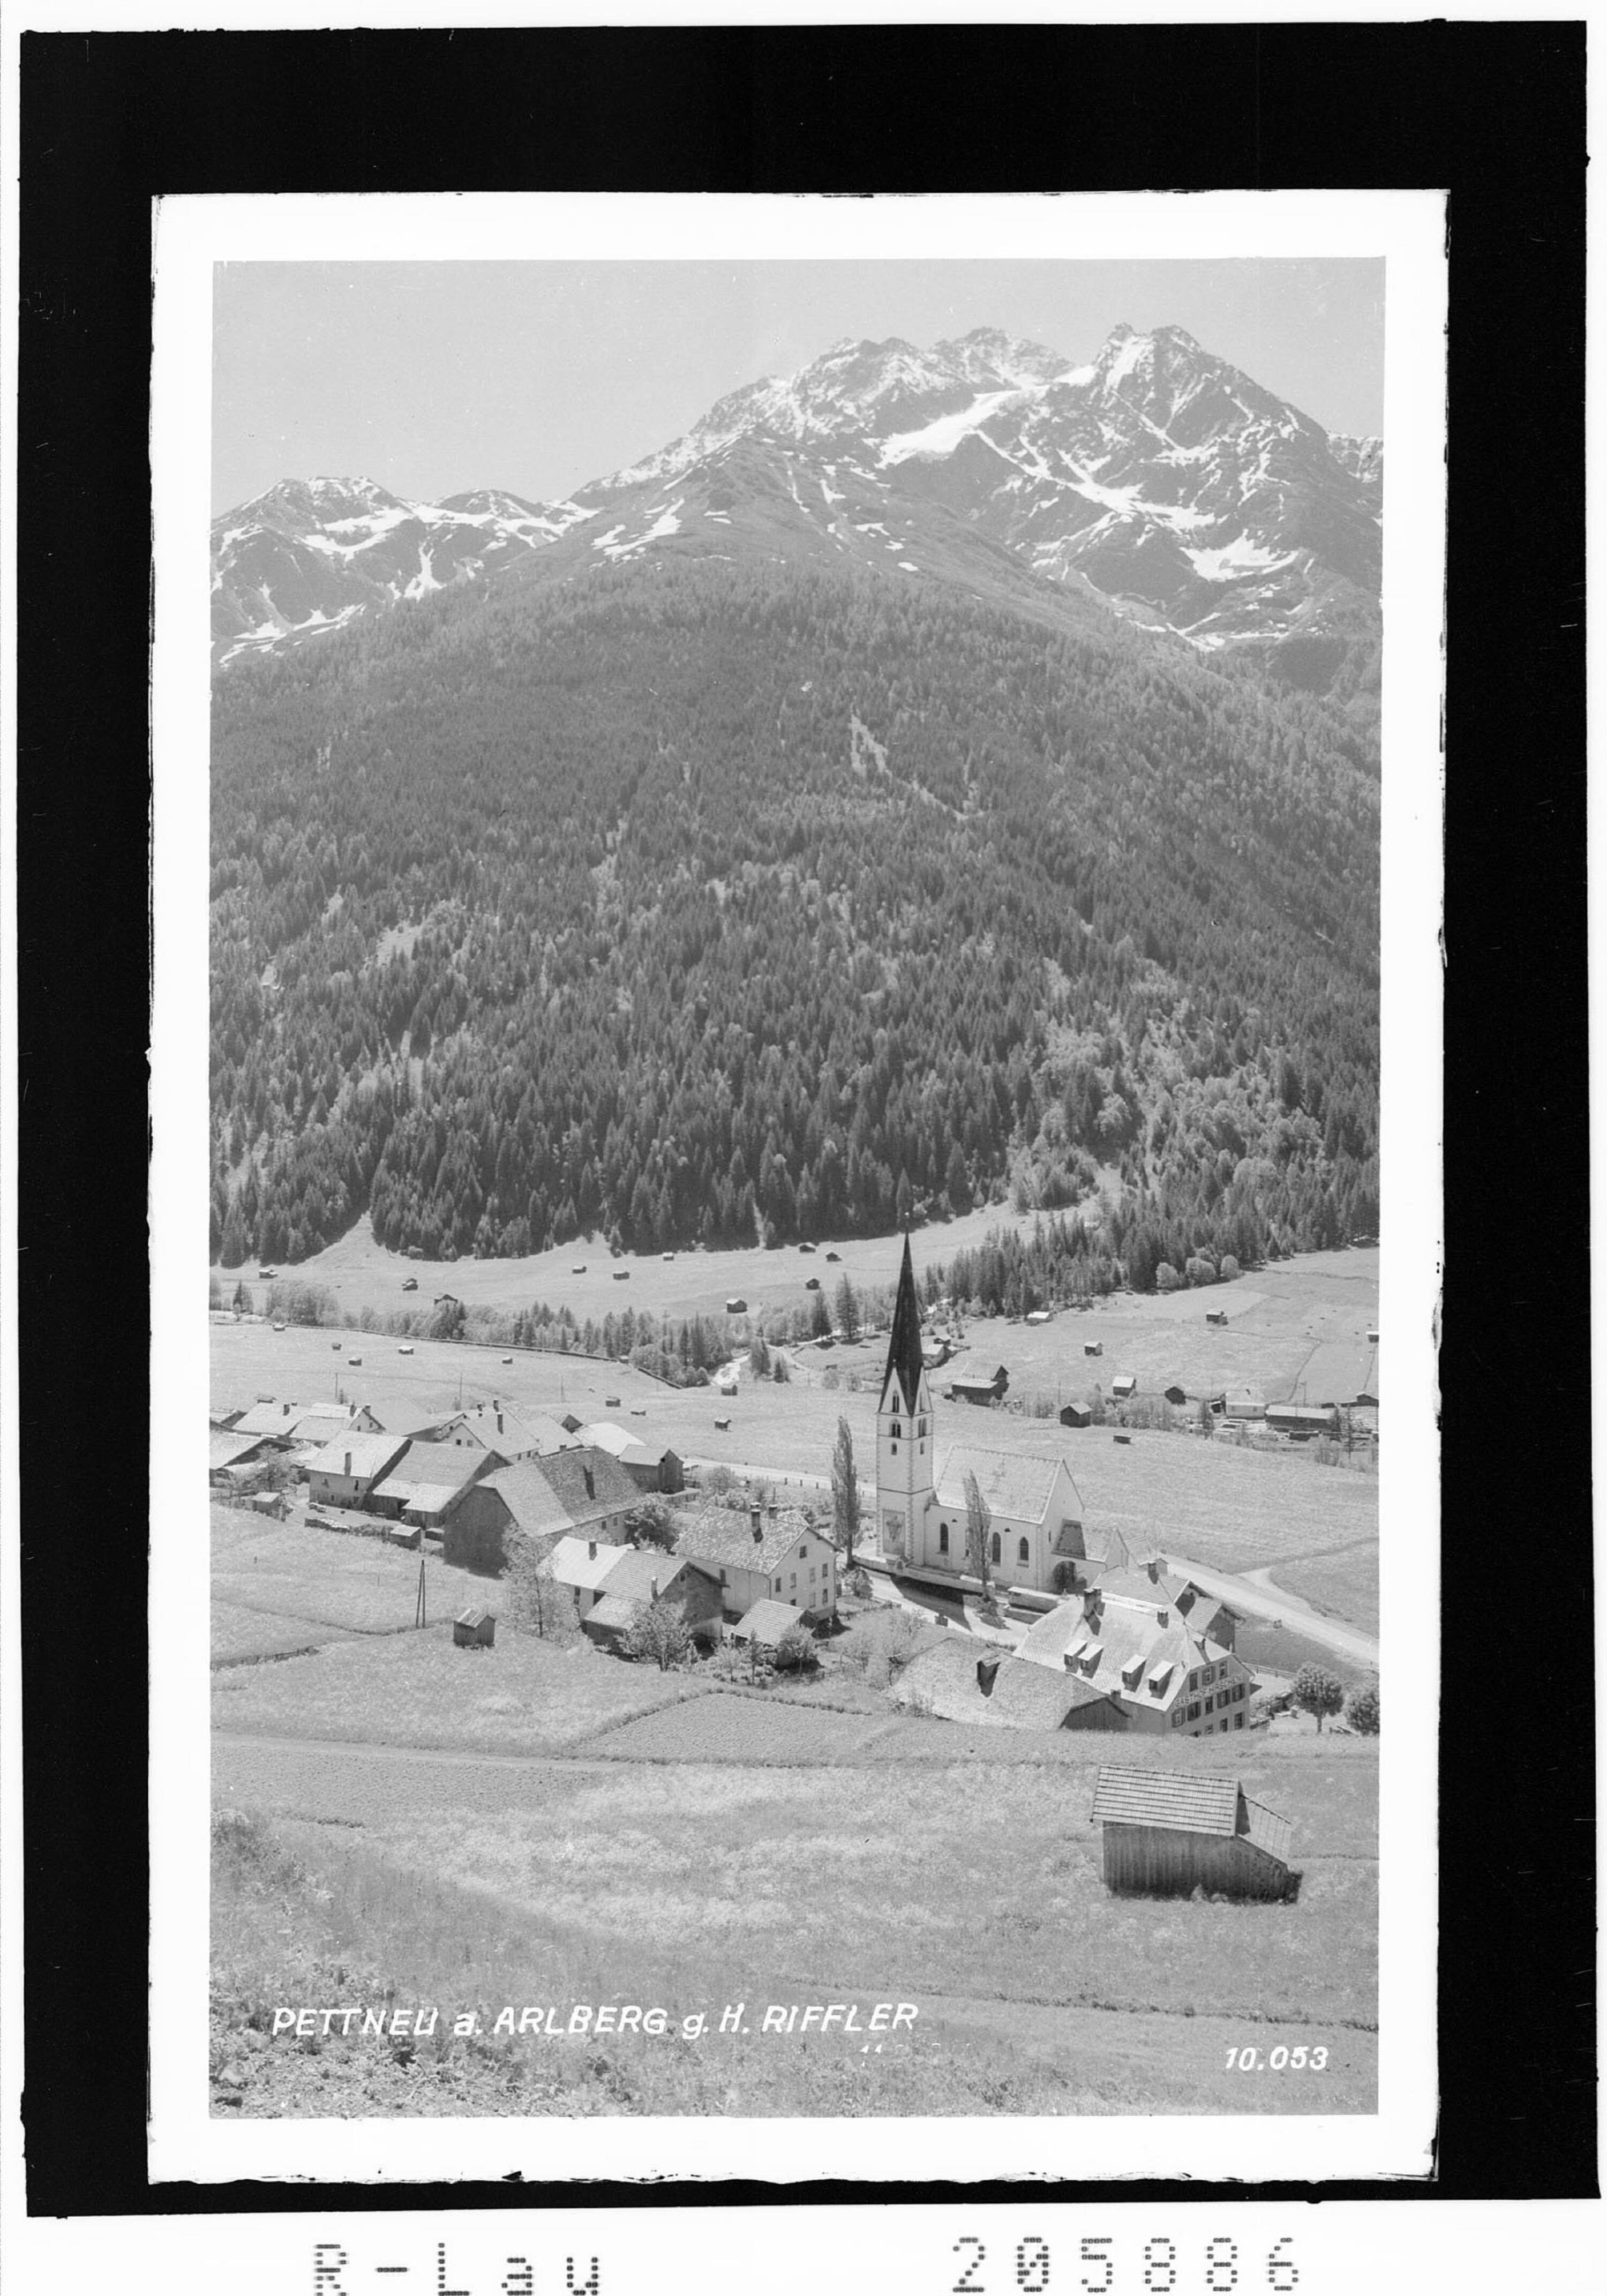 Pettneu am Arlberg gegen Hohen Riffler von Risch-Lau